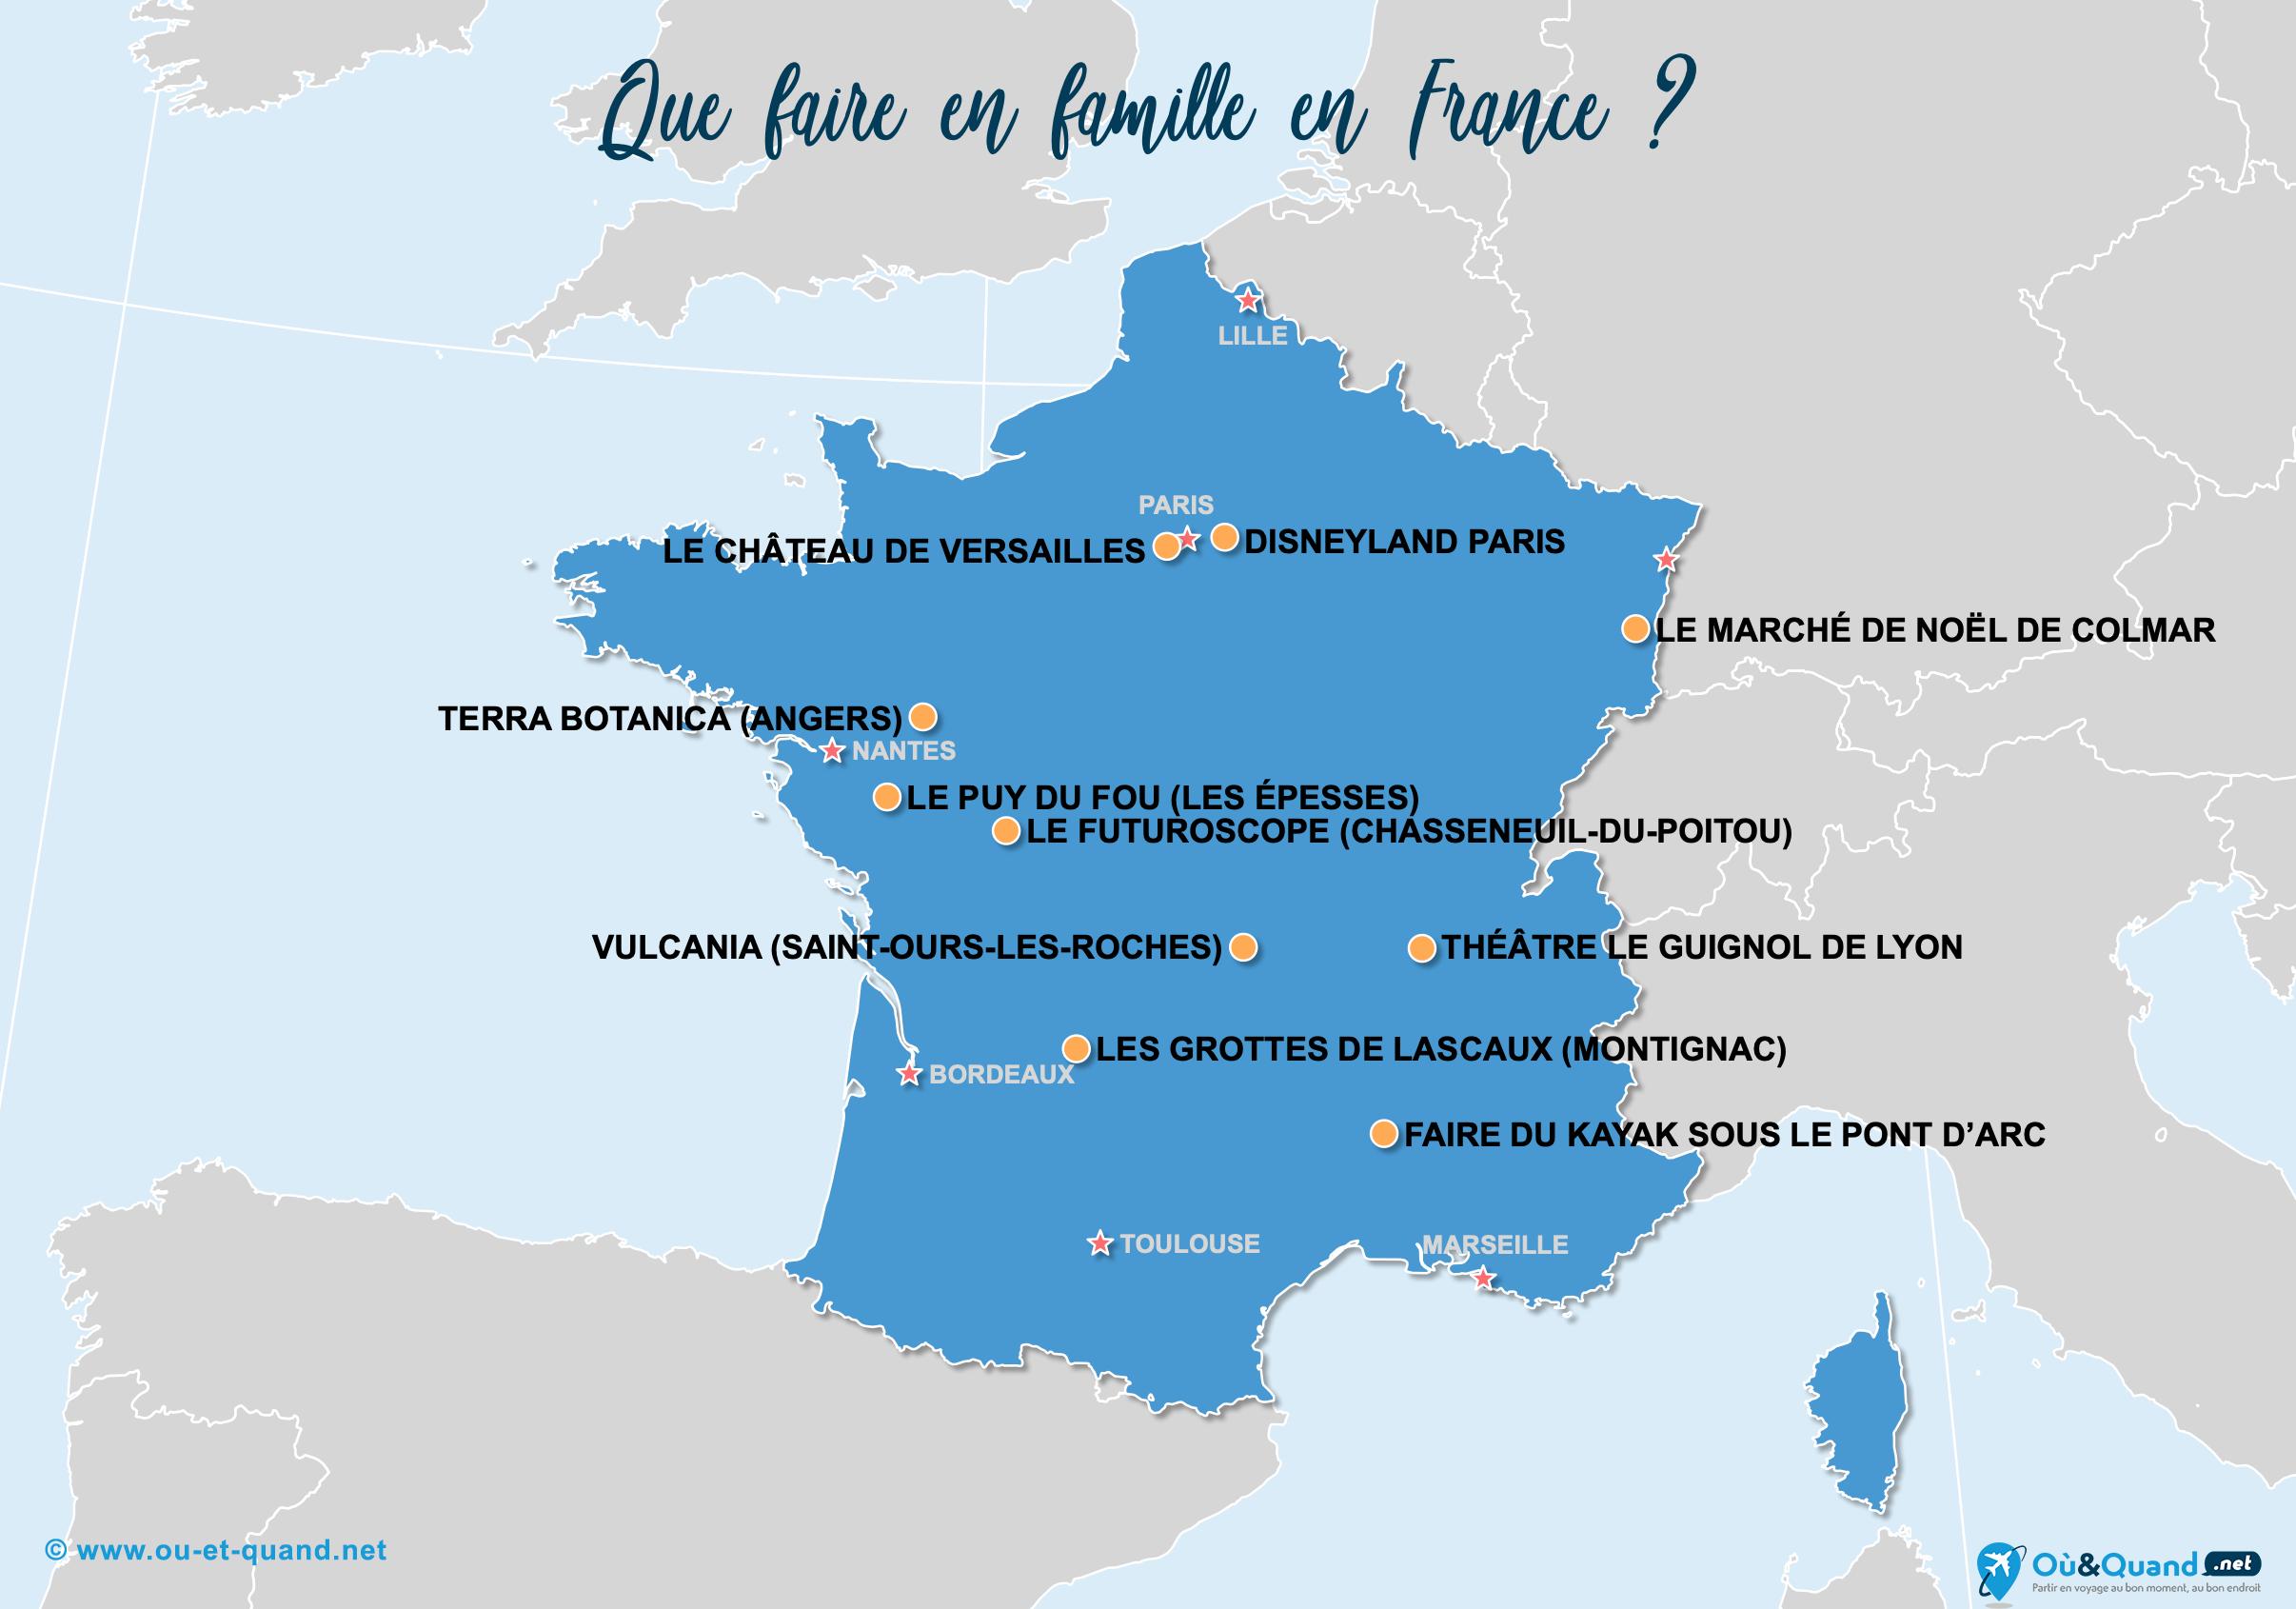 Carte France : La France en famille